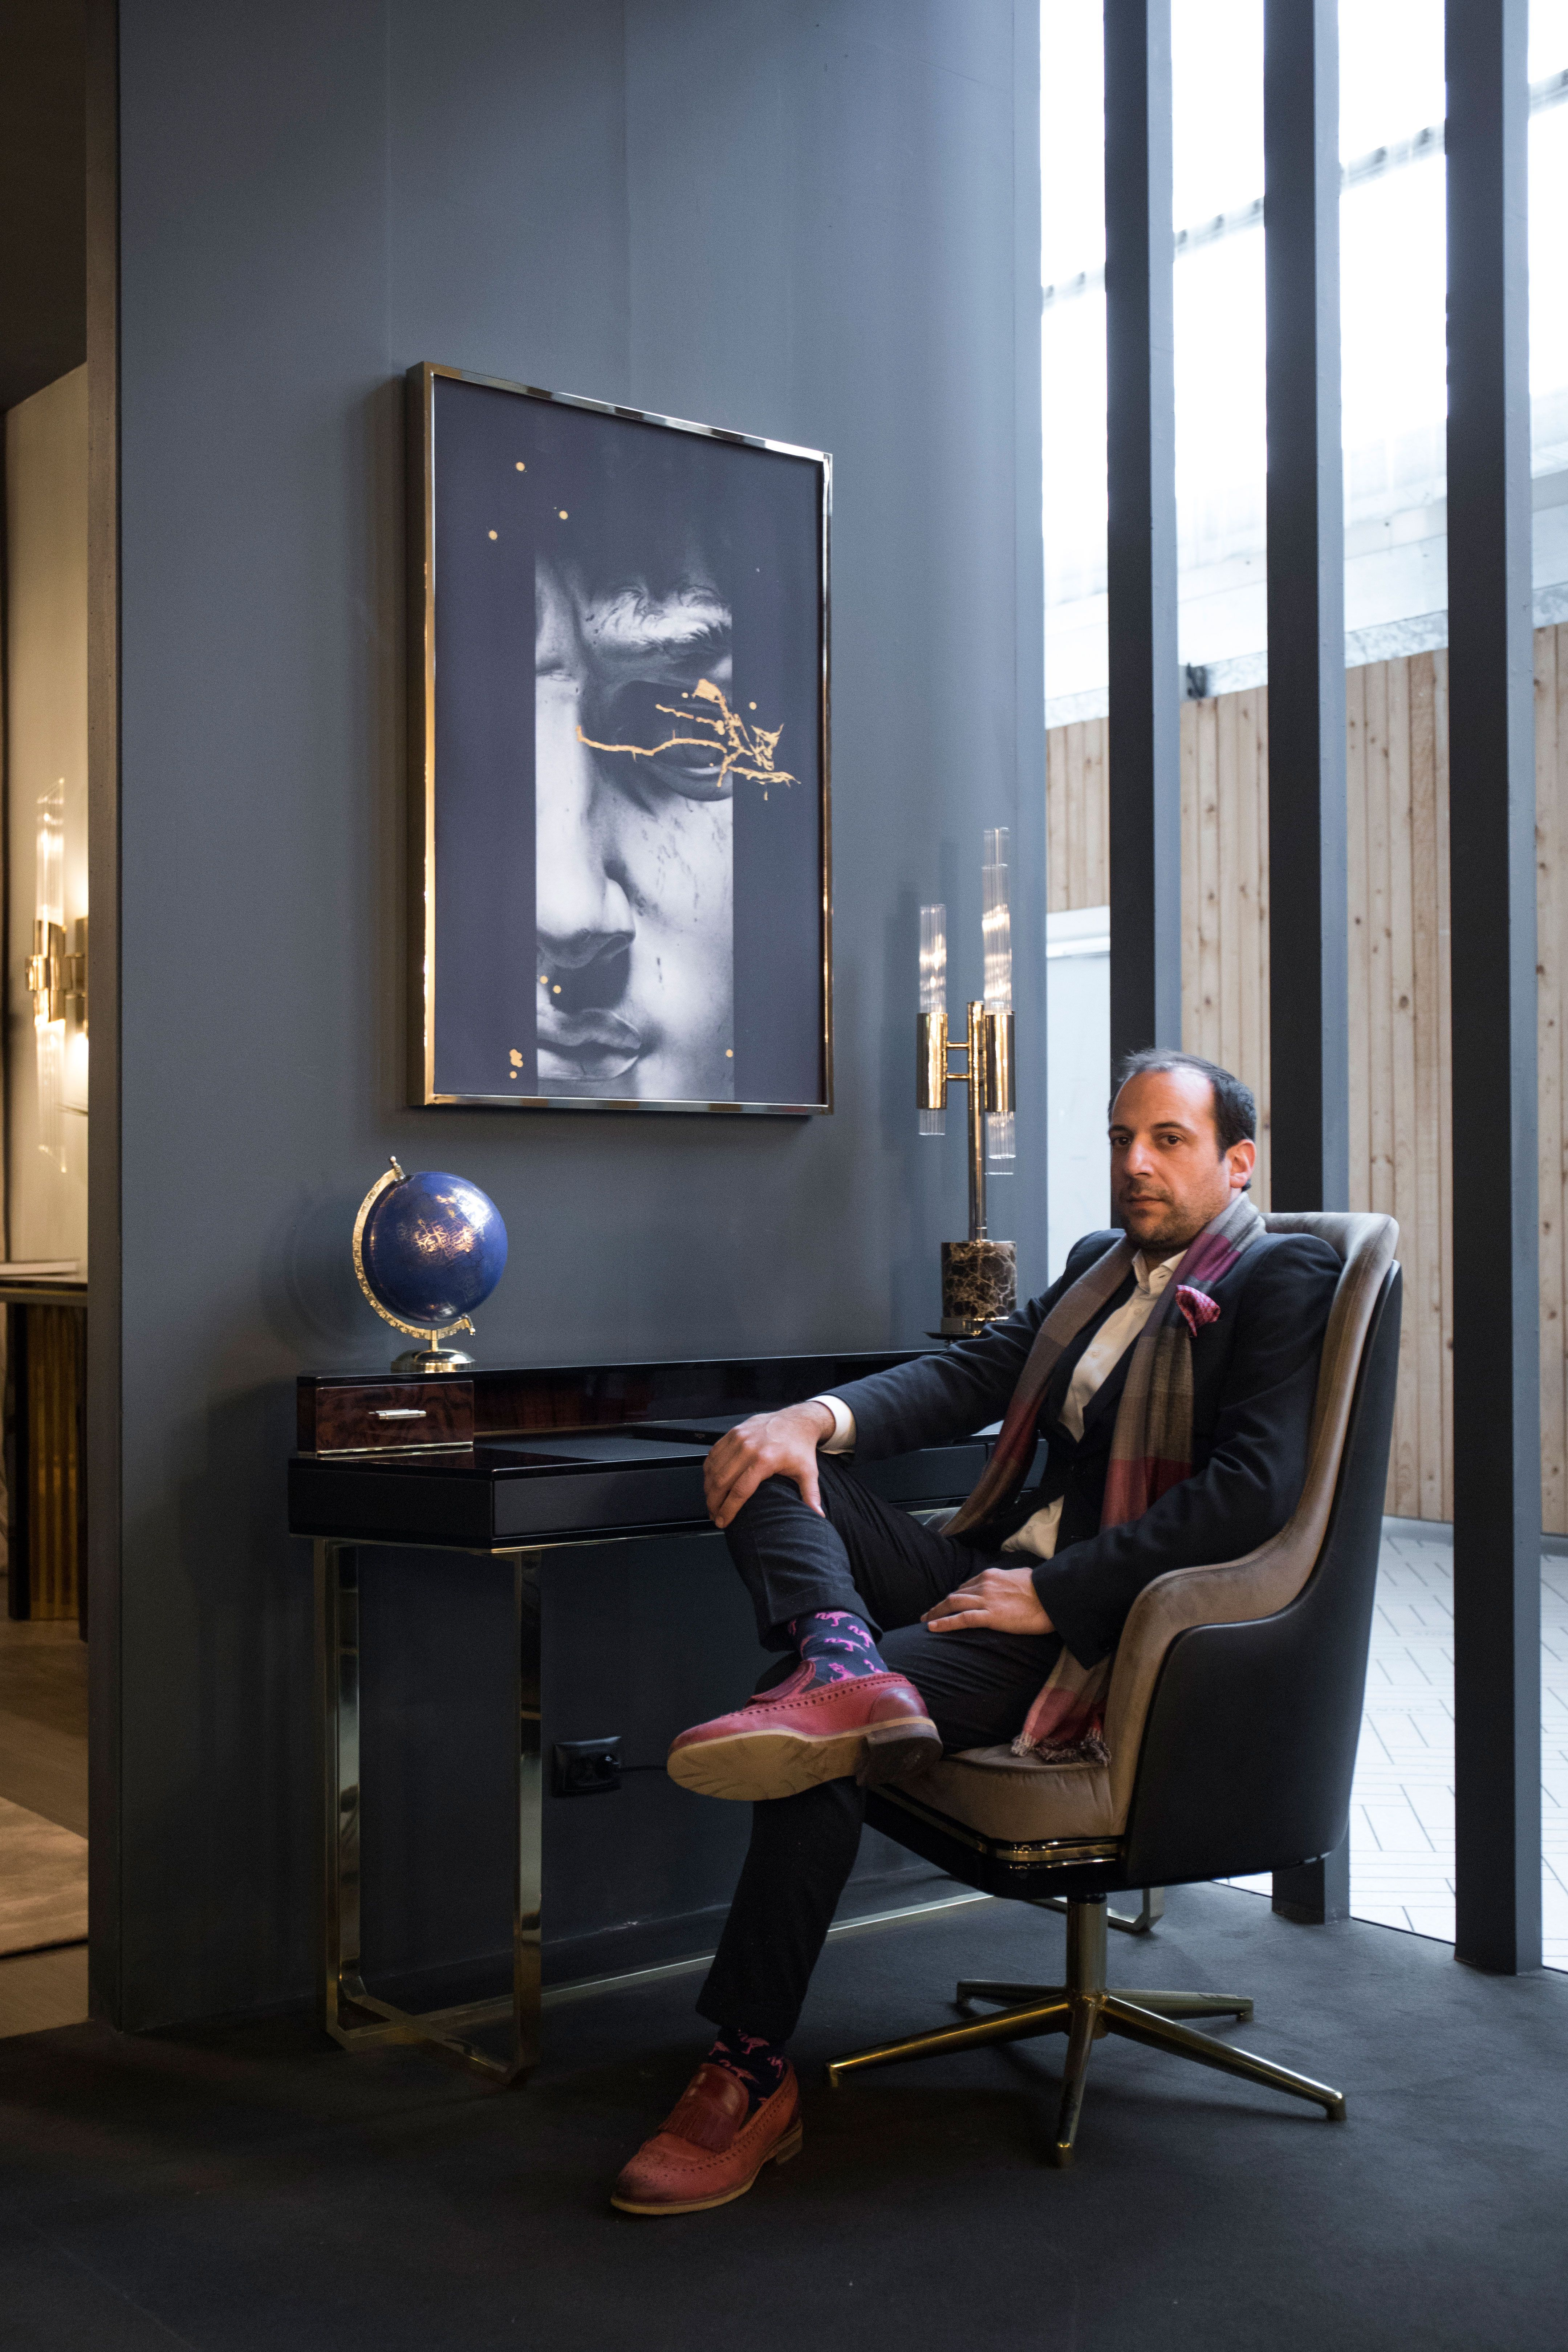 Interior Design Trends Presented At Maison Objet 2019 Design Trends Luxury Interior Luxury Interior Design